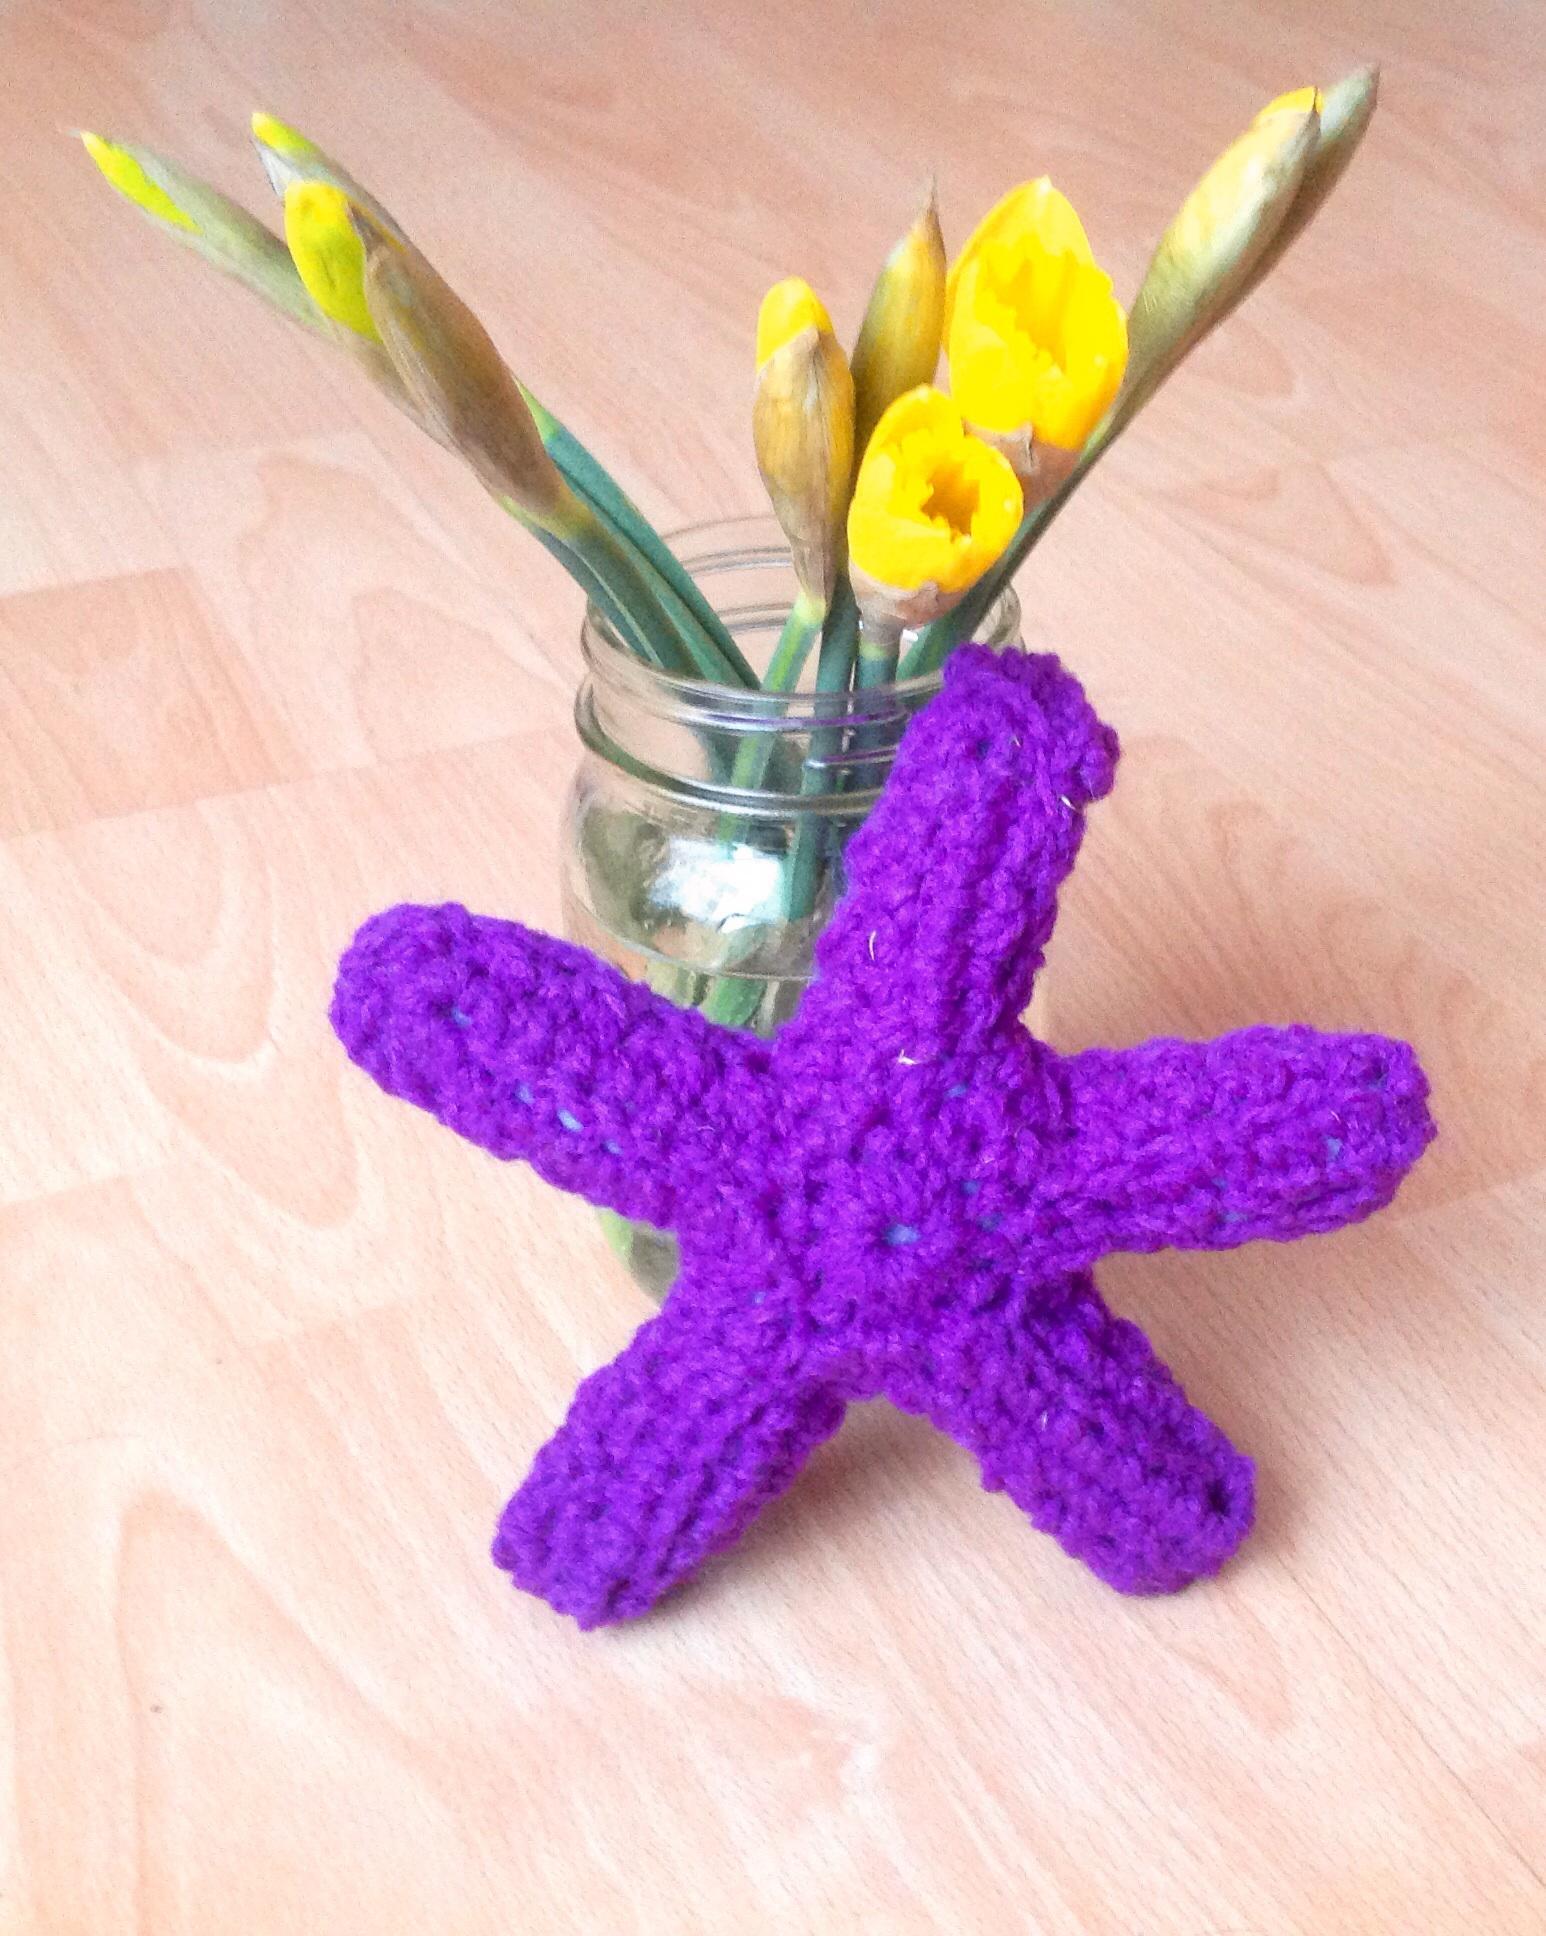 Crochet starfish by Hiphiphurray4Crochet